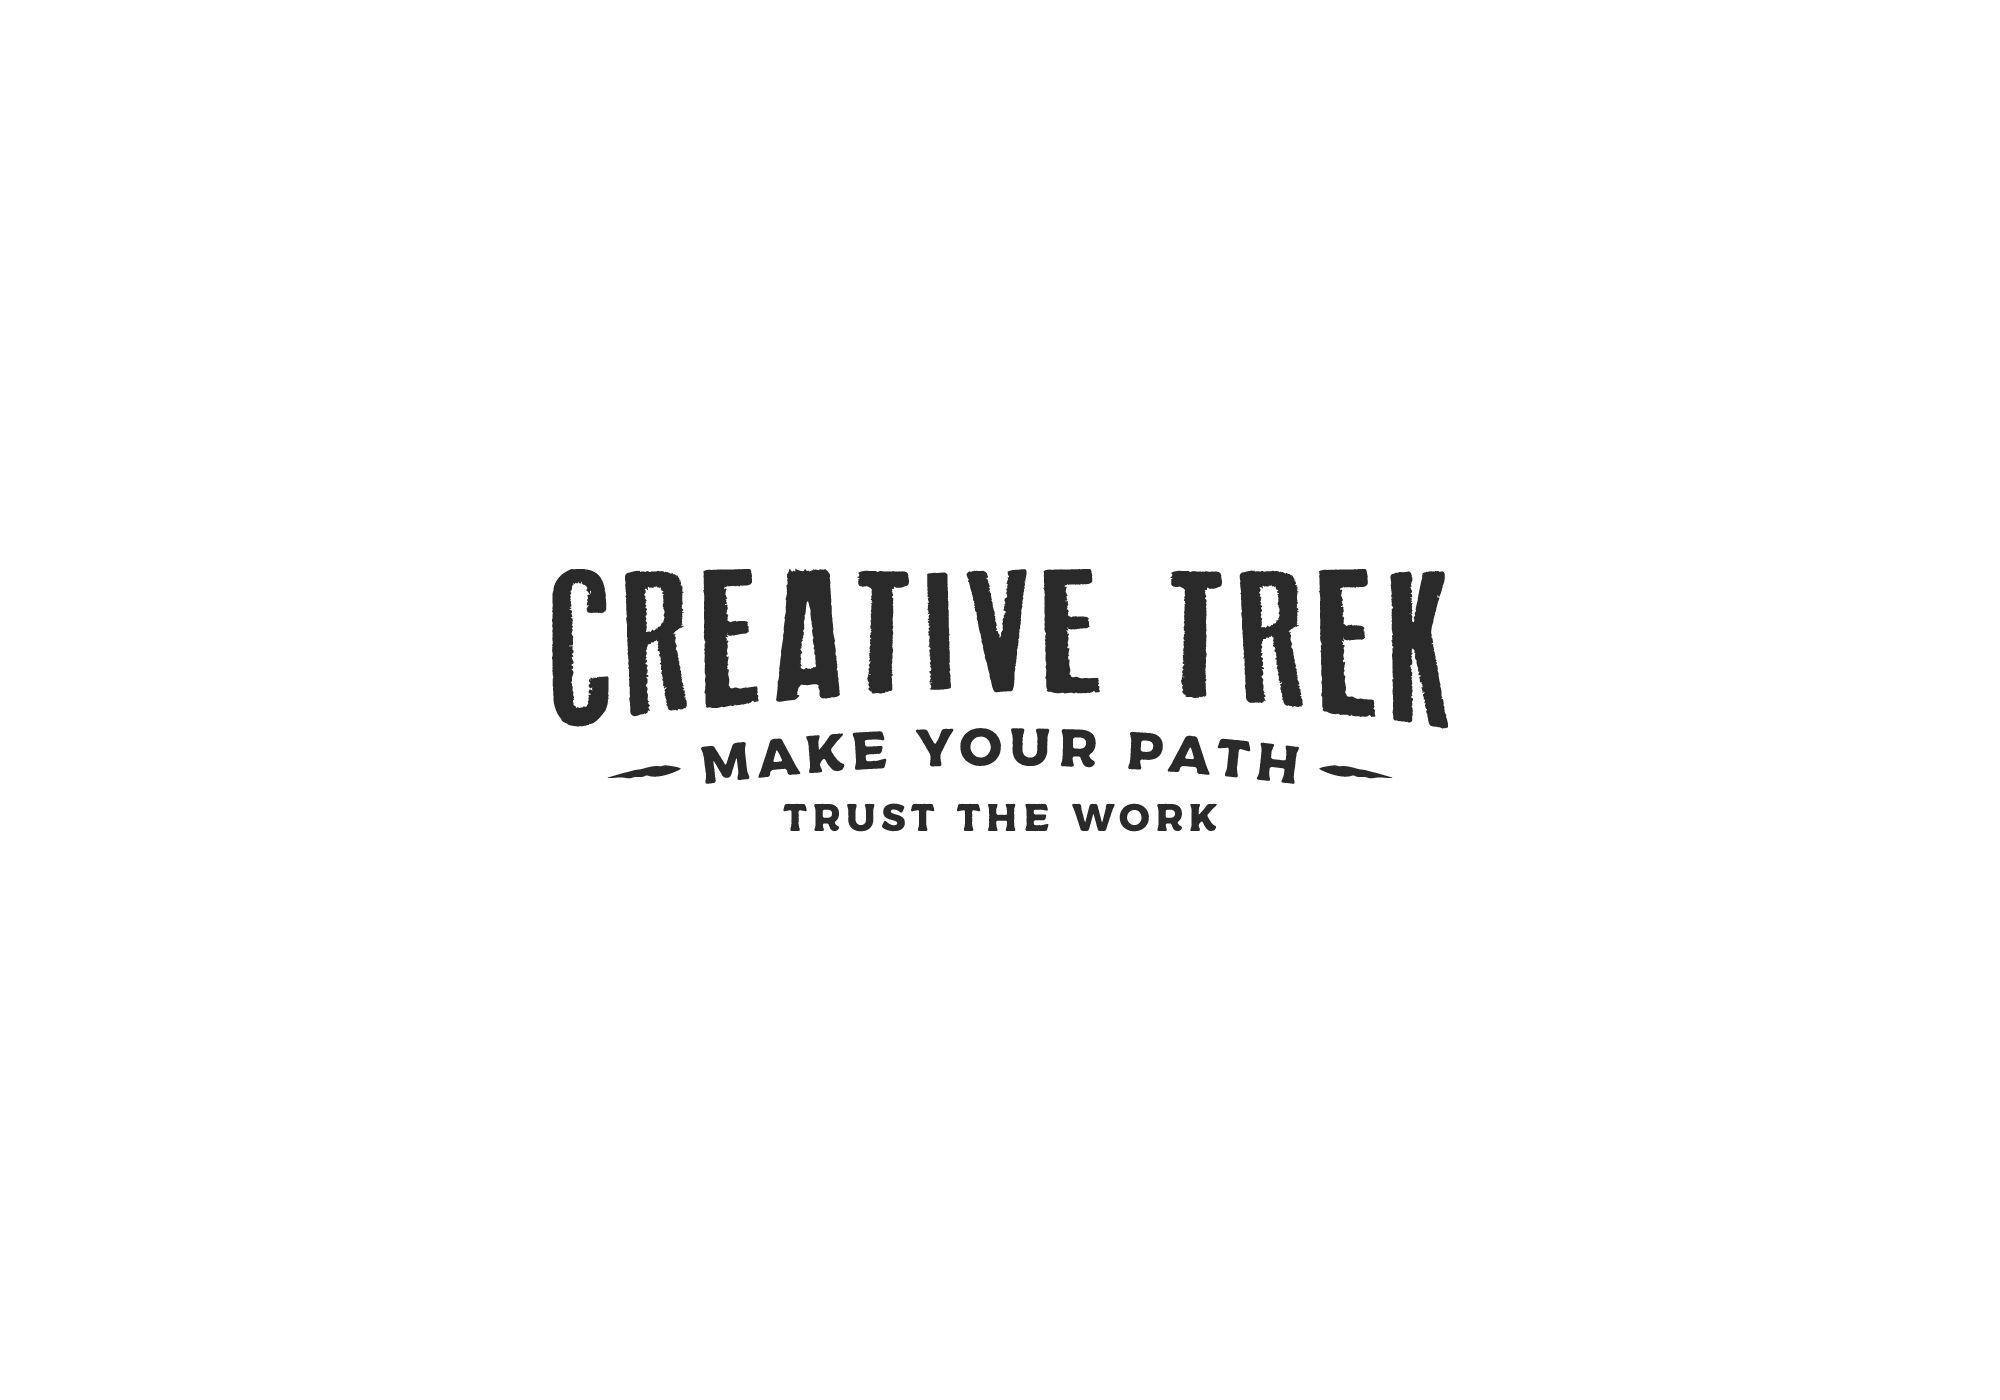 Revisions Creative Trek